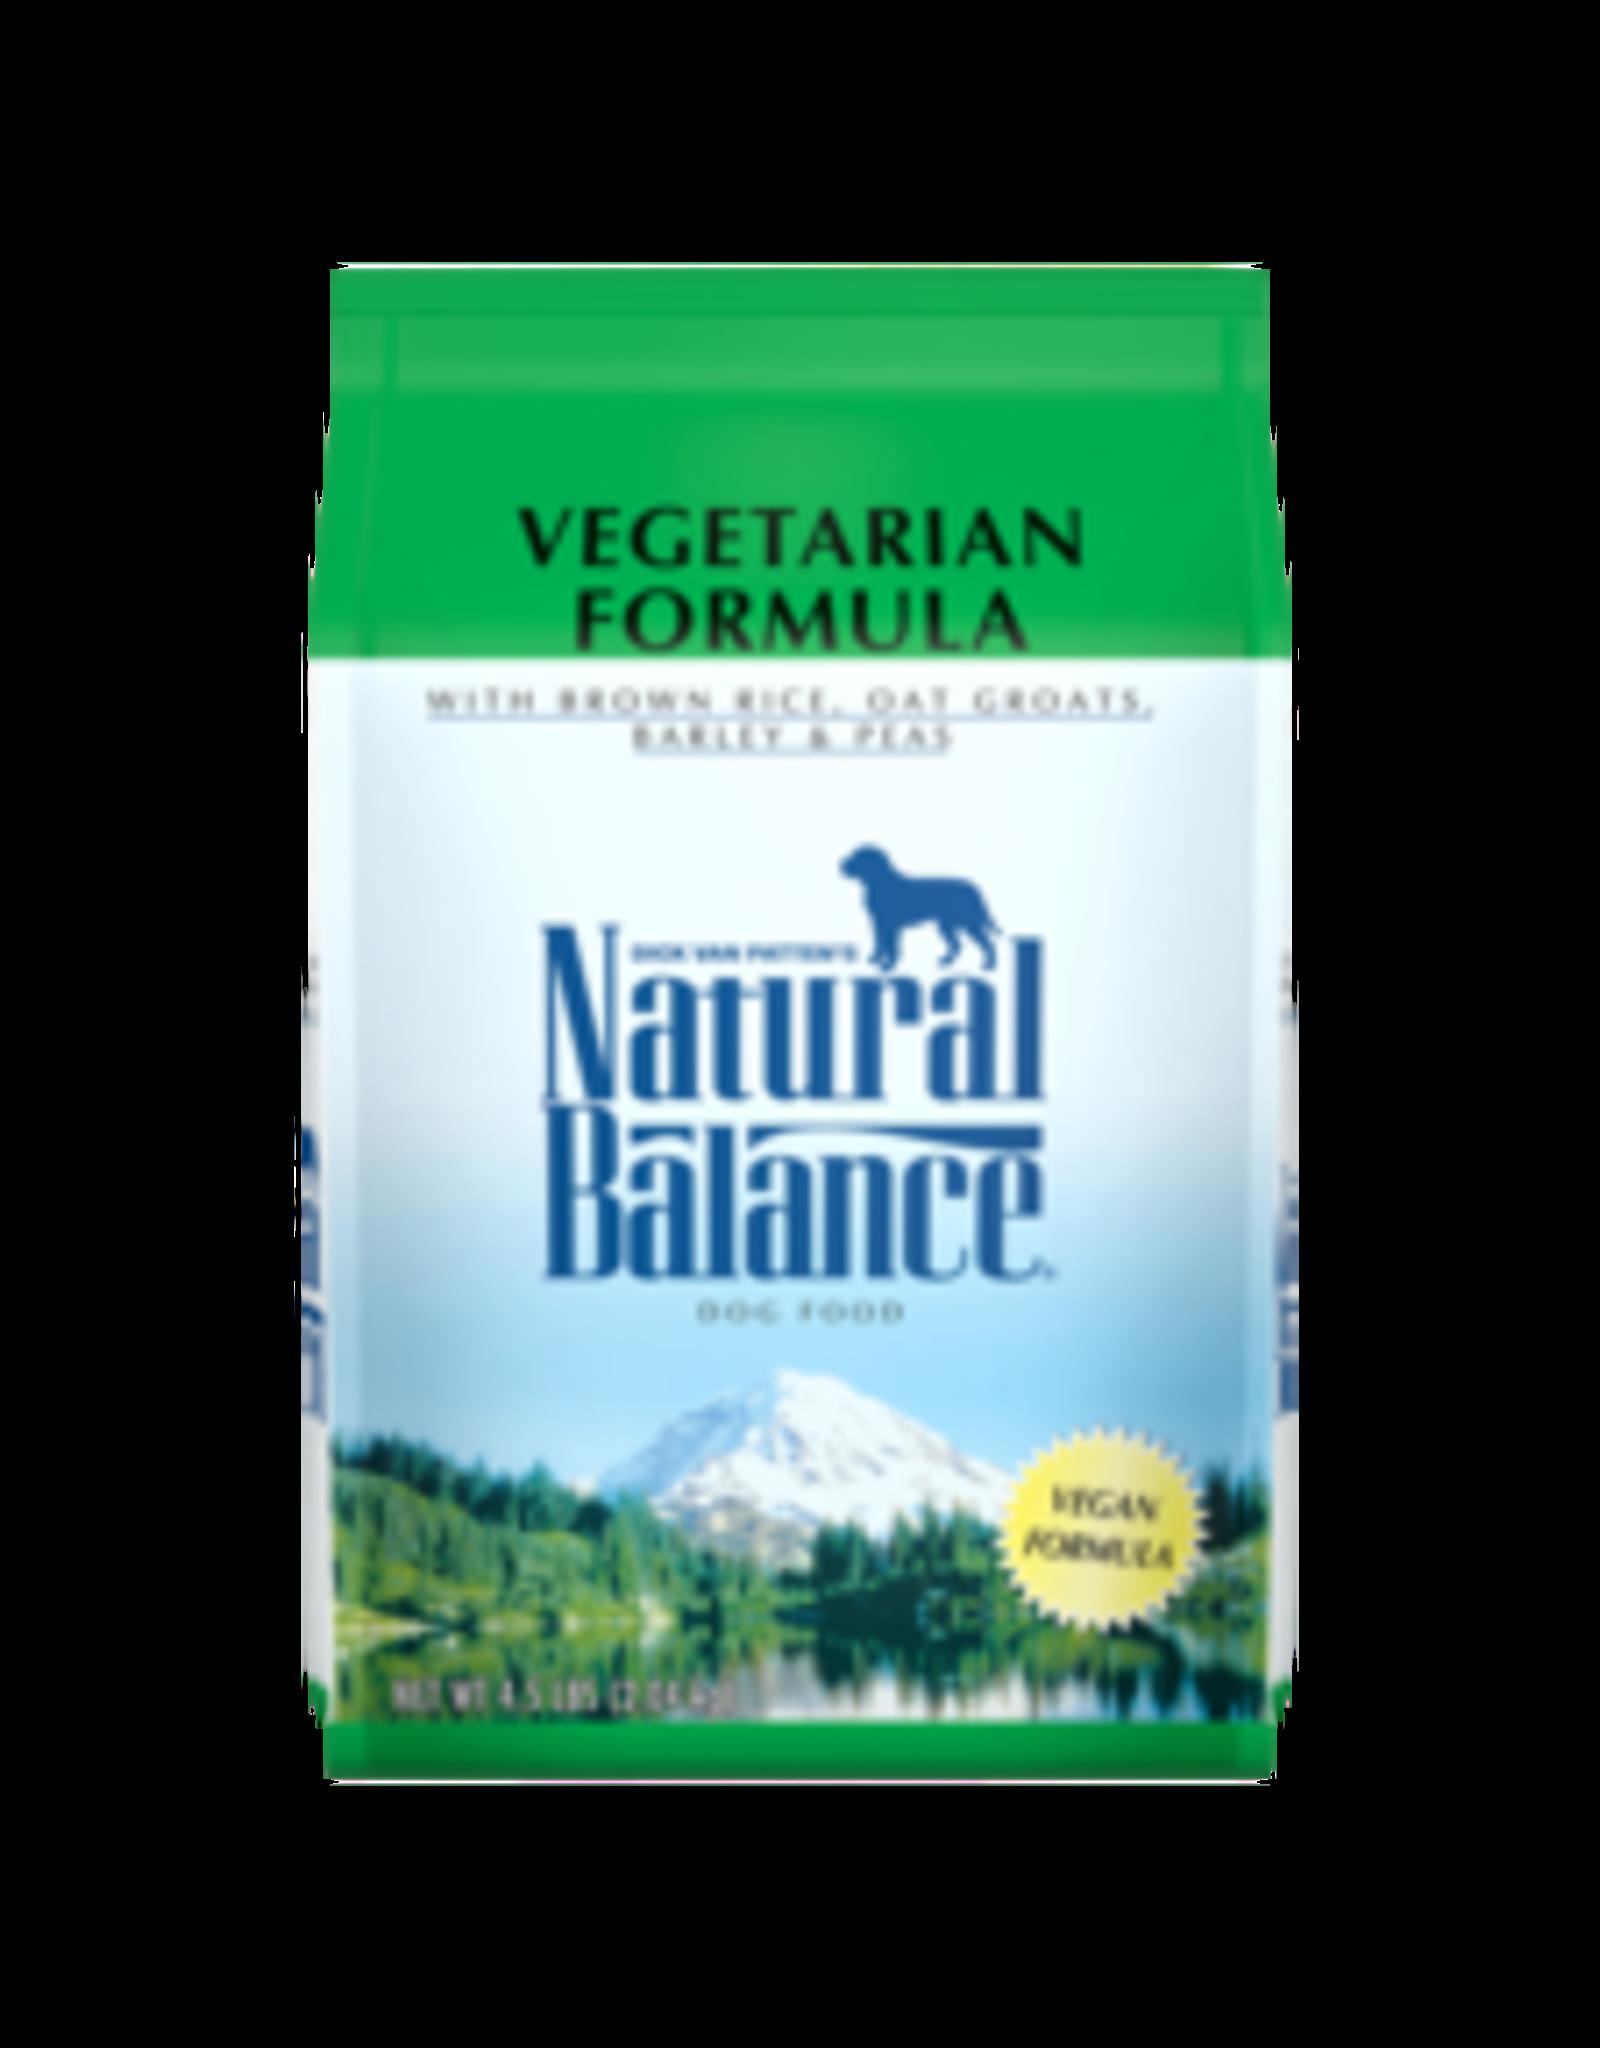 Natural Balance Natural Balance Vegetarian